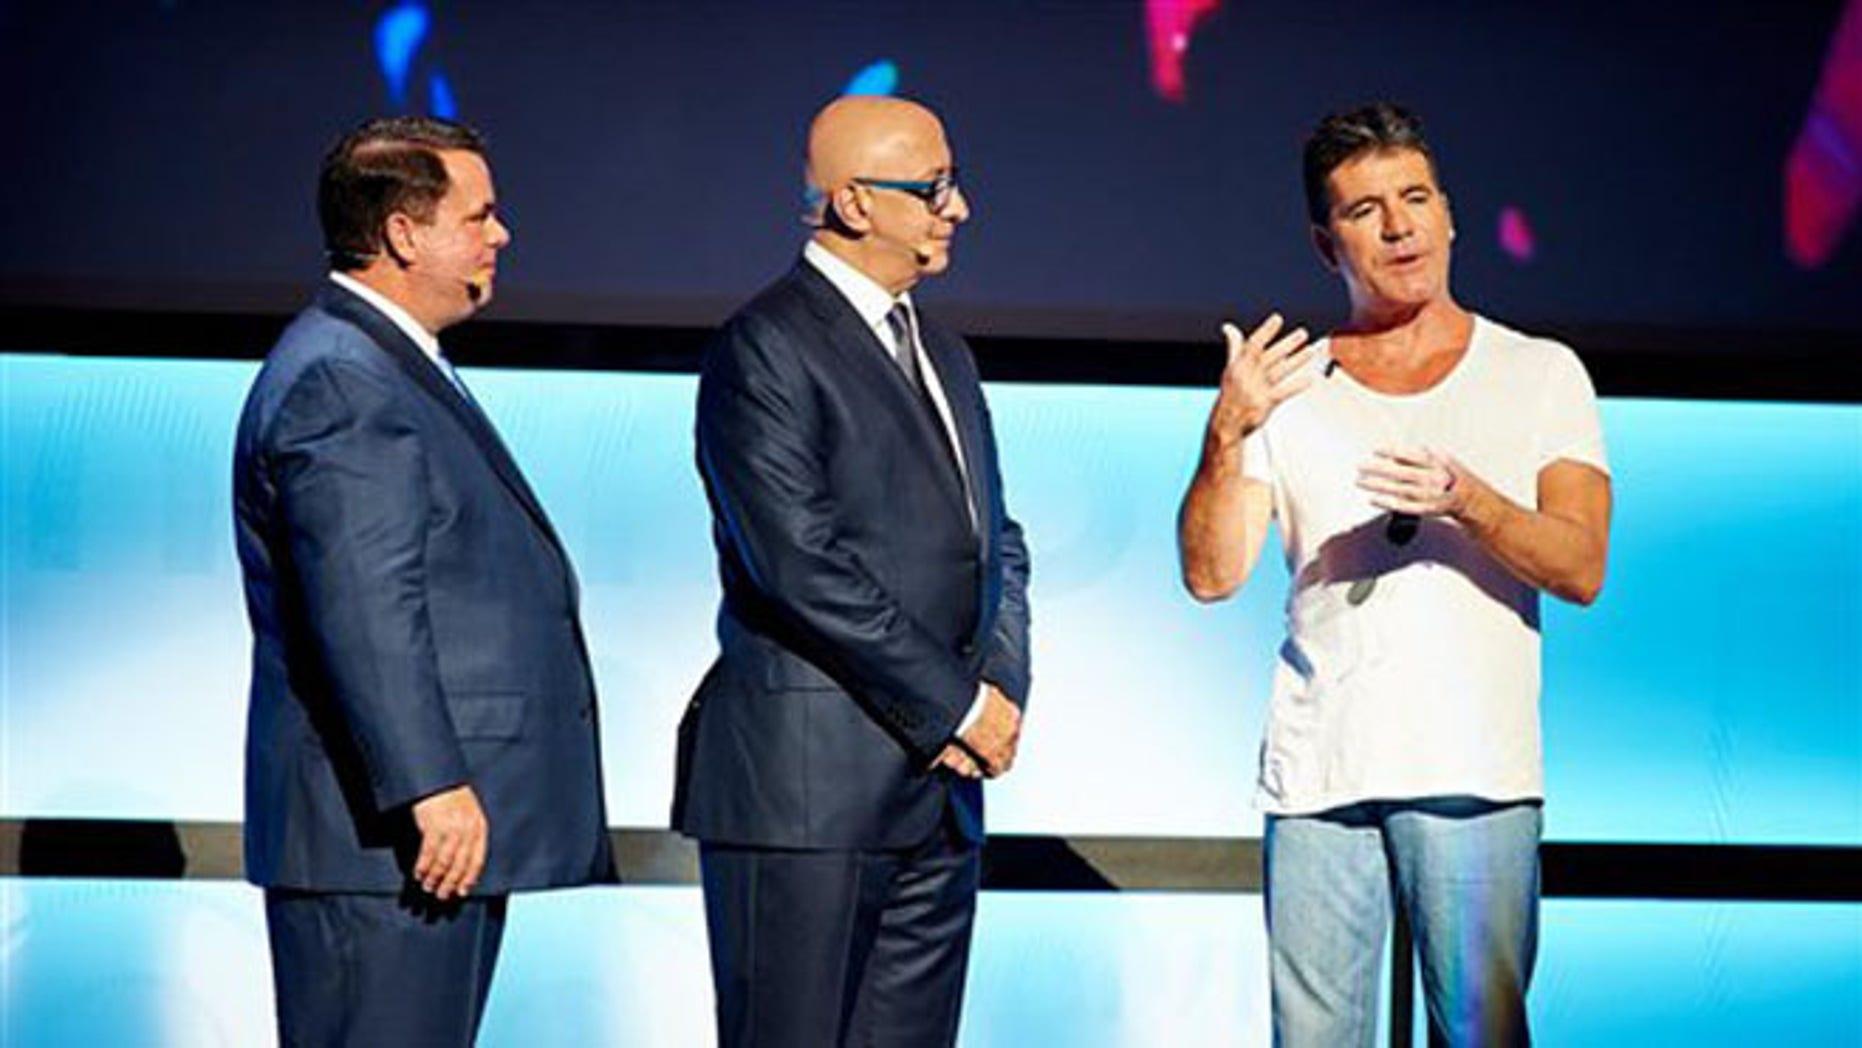 Univision executives Steve Mandala and Alberto Ciurana with Simon Cowell on Tuesday, May 13, 2014 in New York City.